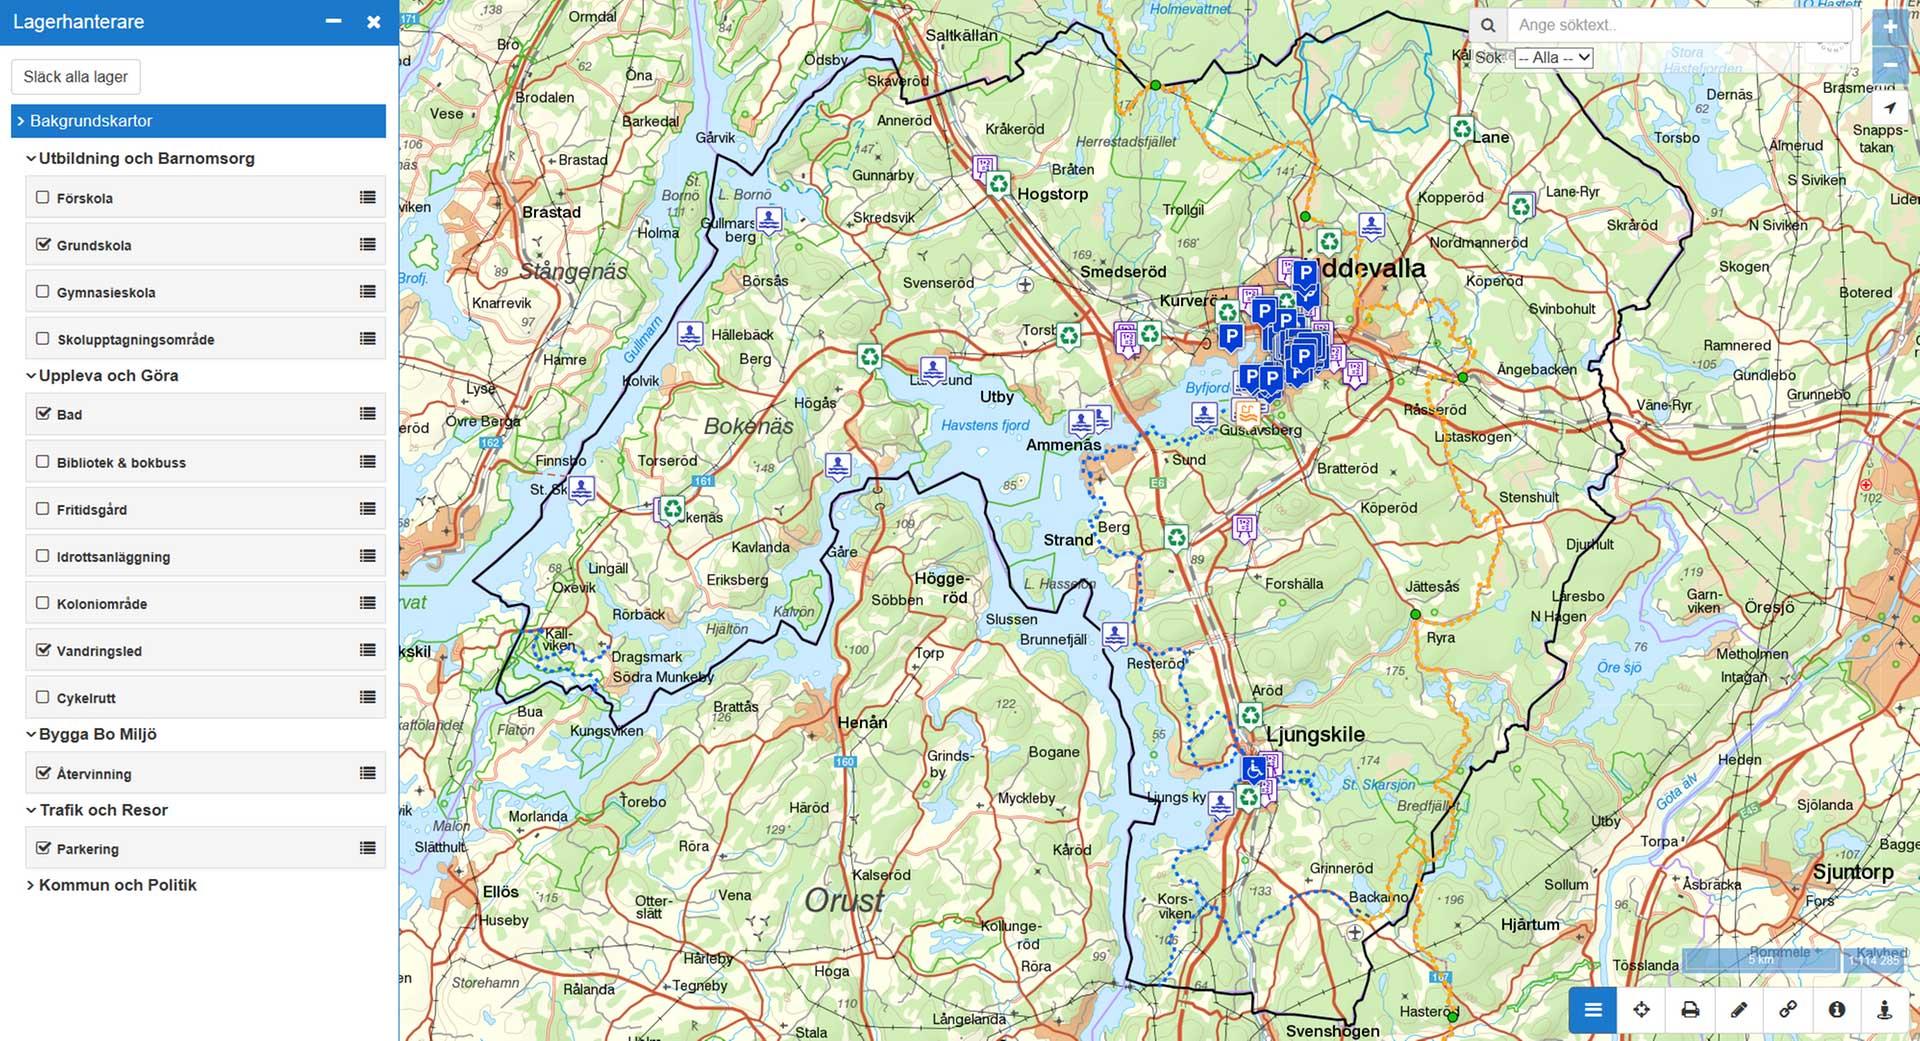 karta uddevalla Kartor   Uddevalla kommun karta uddevalla